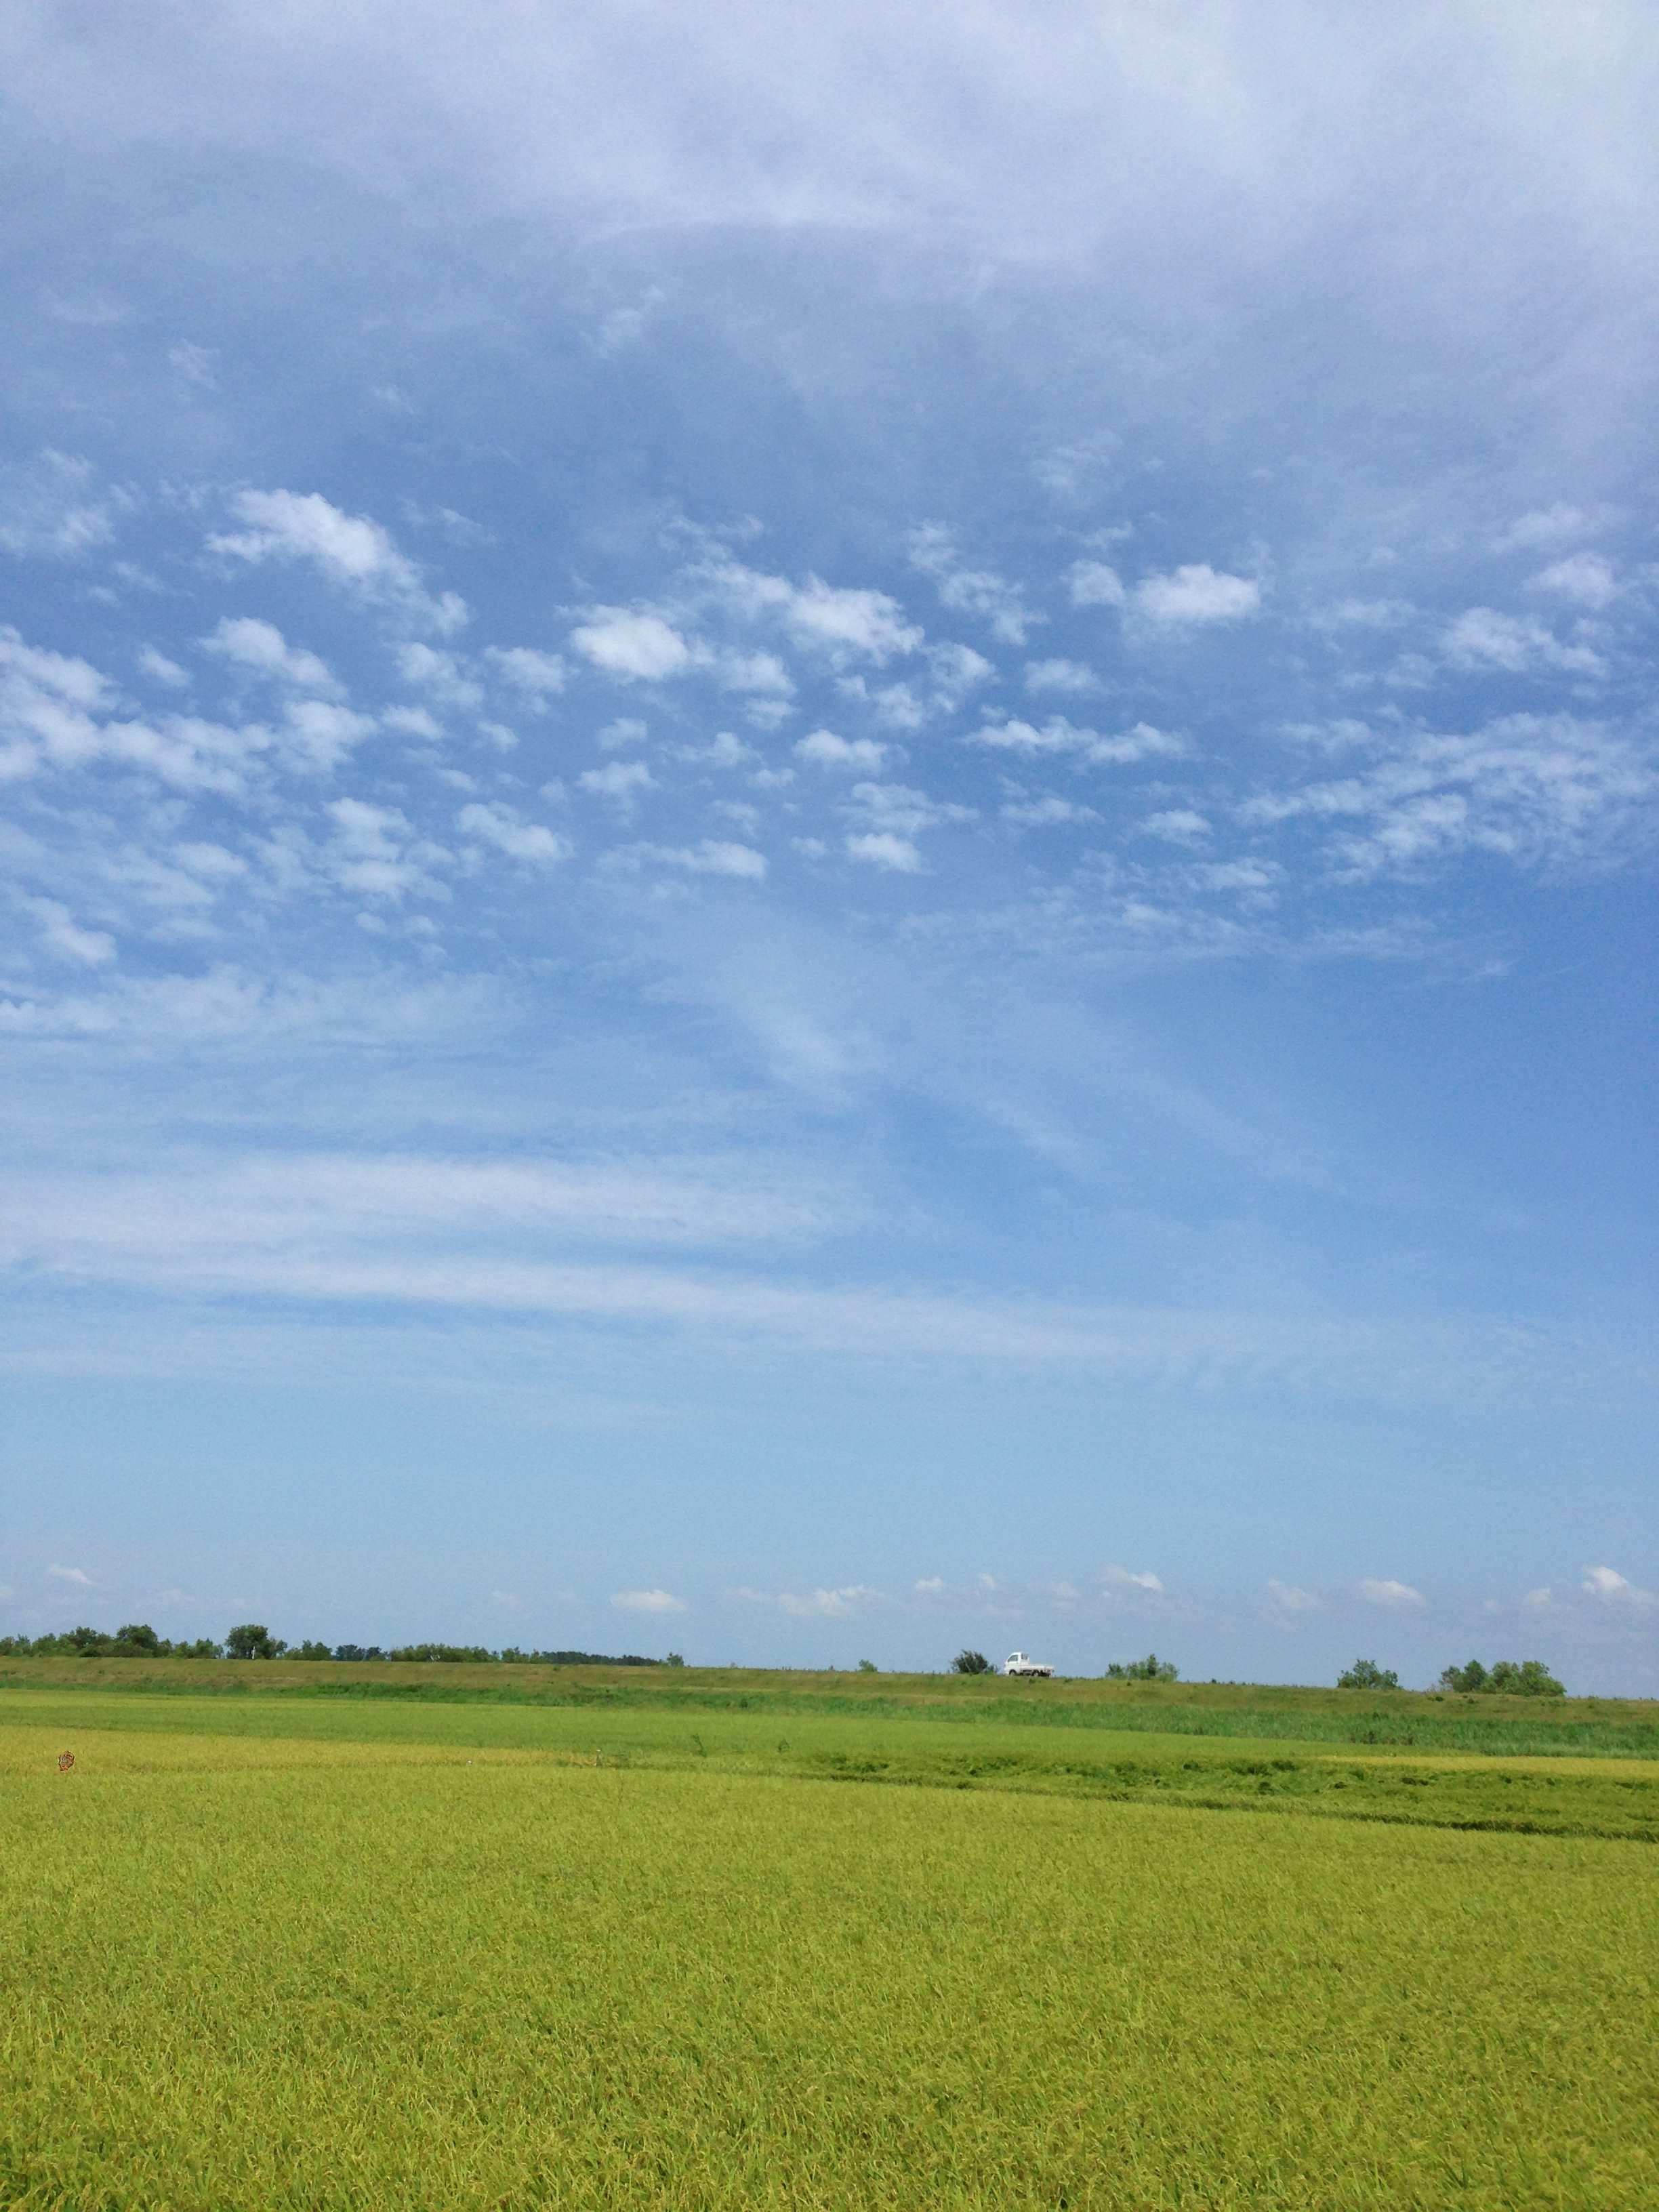 2014-08-13 11.20.30_R.jpg